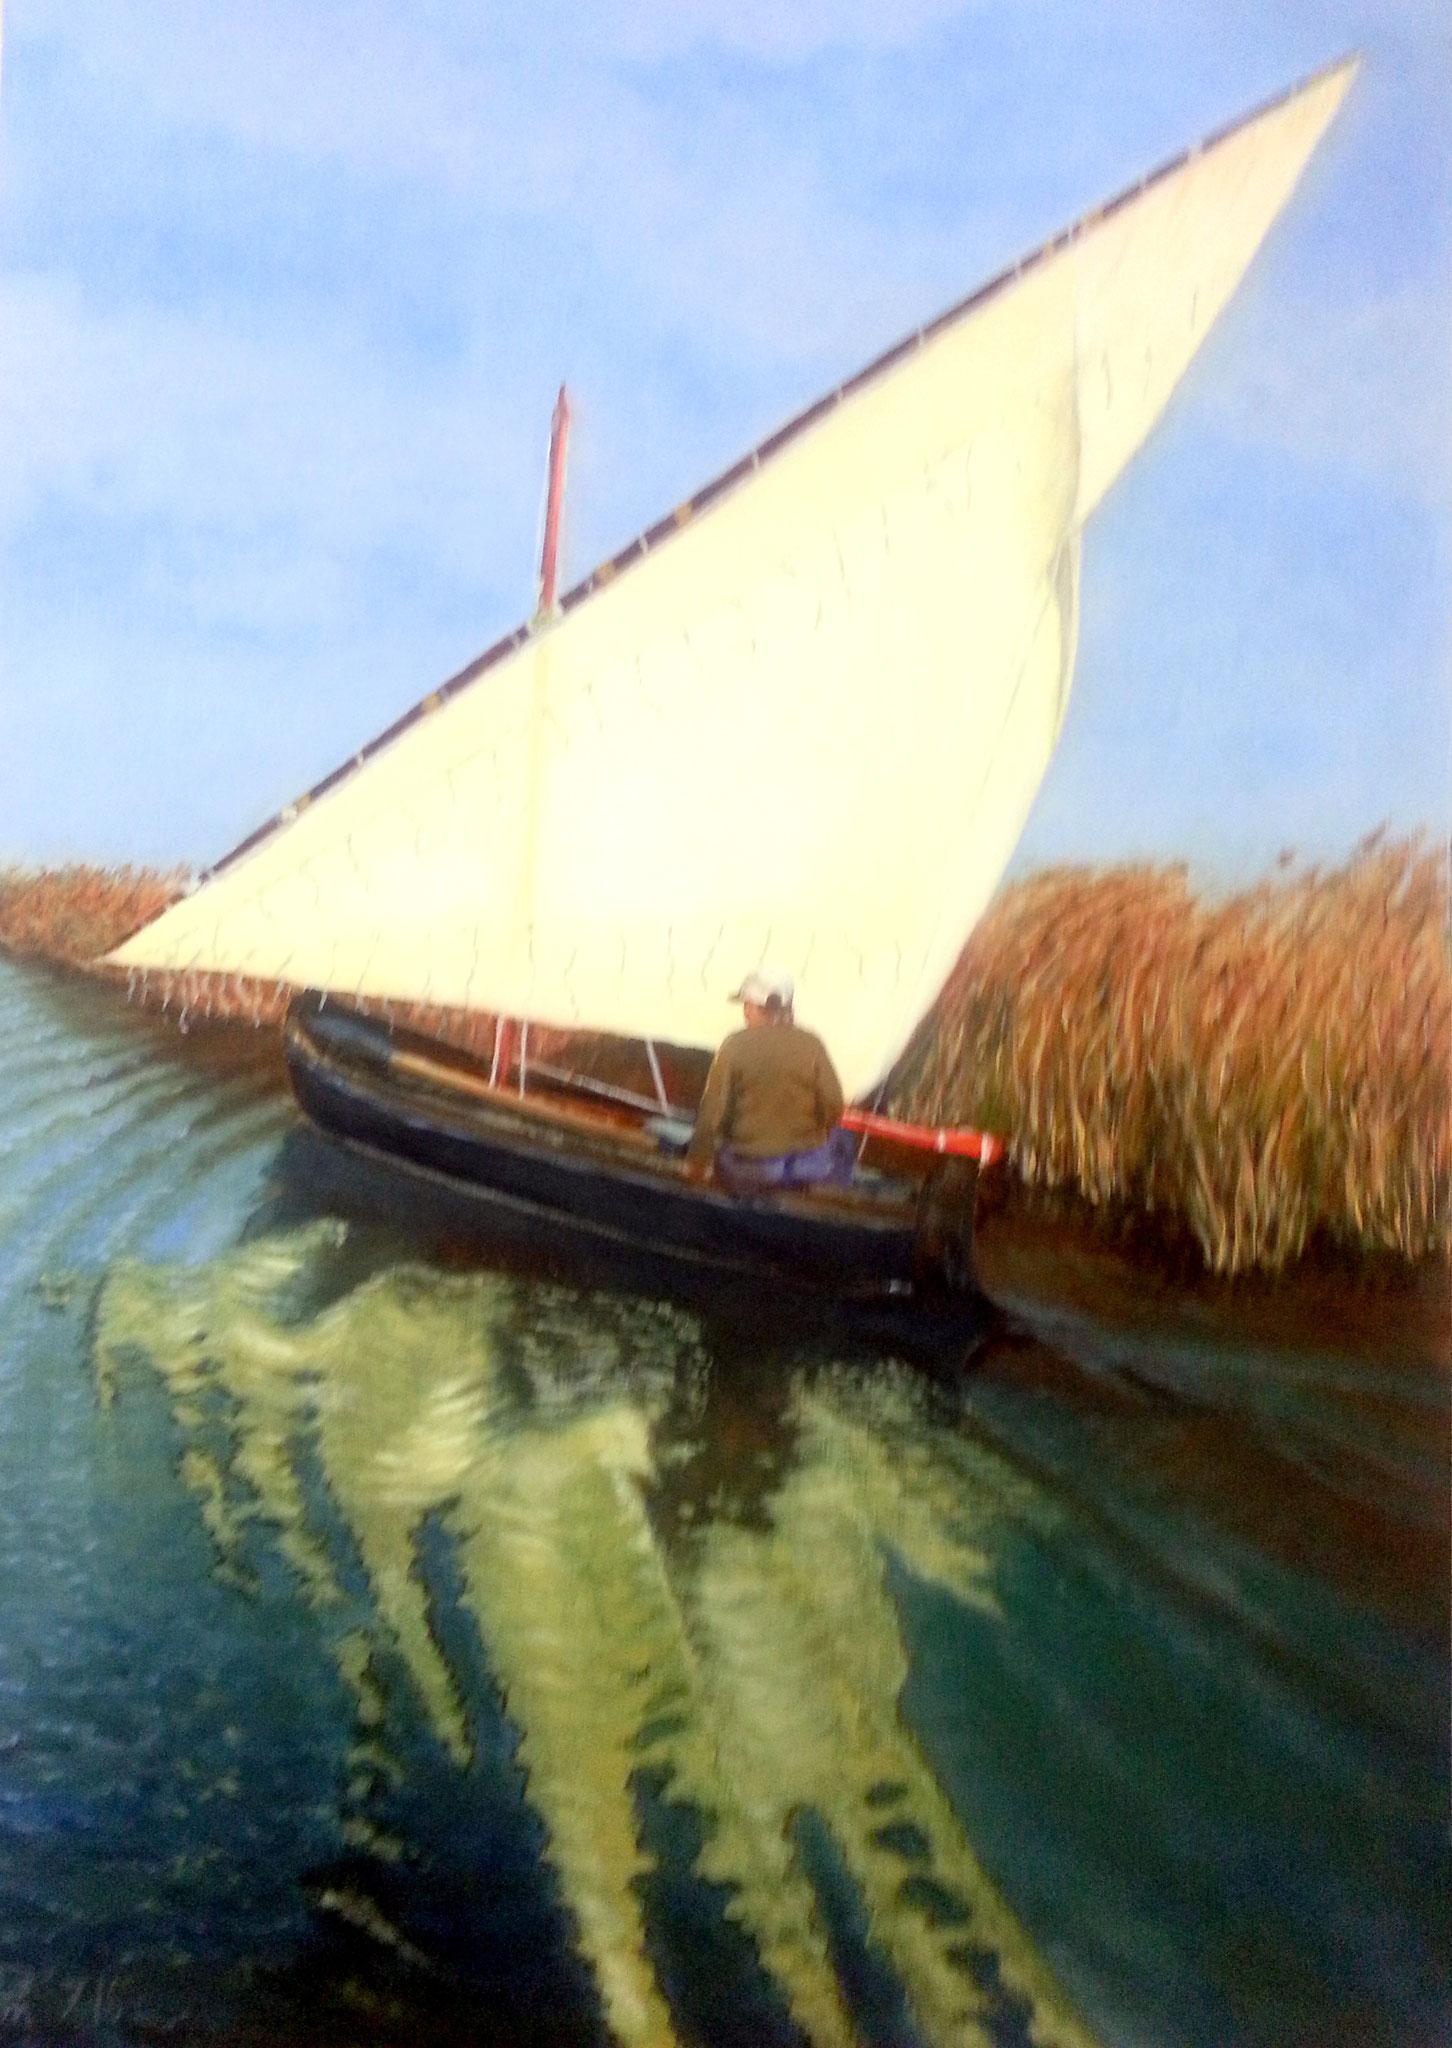 Barca en canal